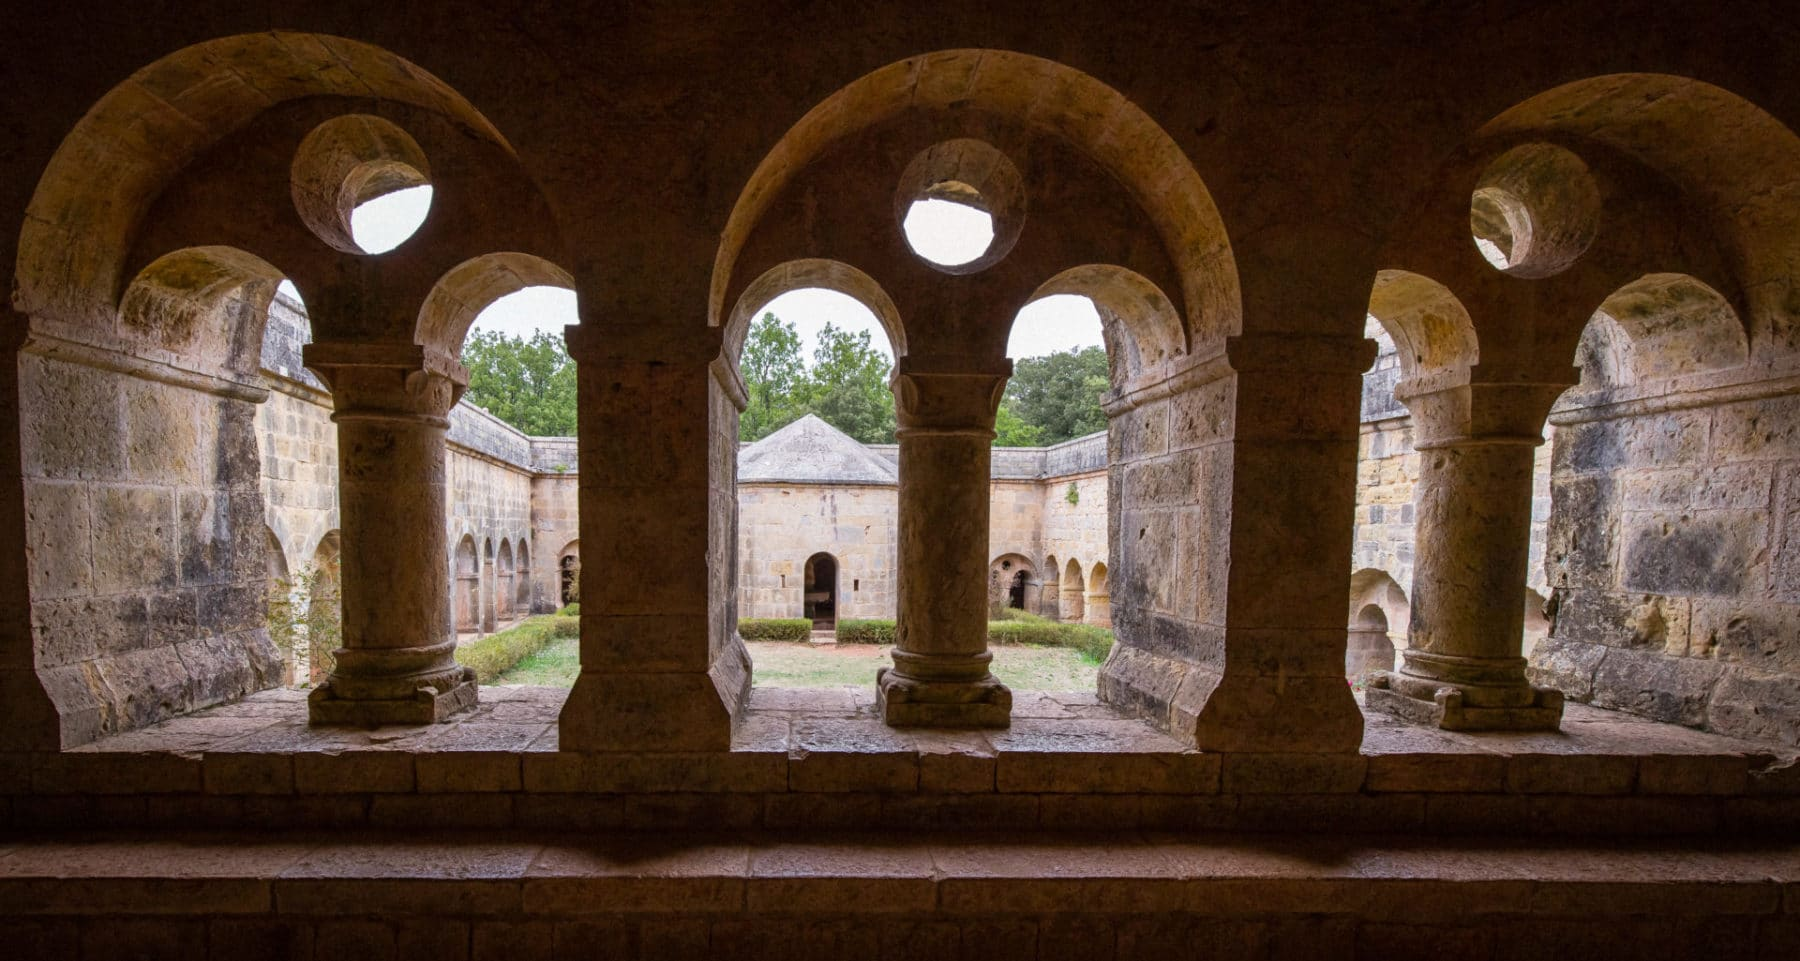 iStock - Abbaye du Thoronet